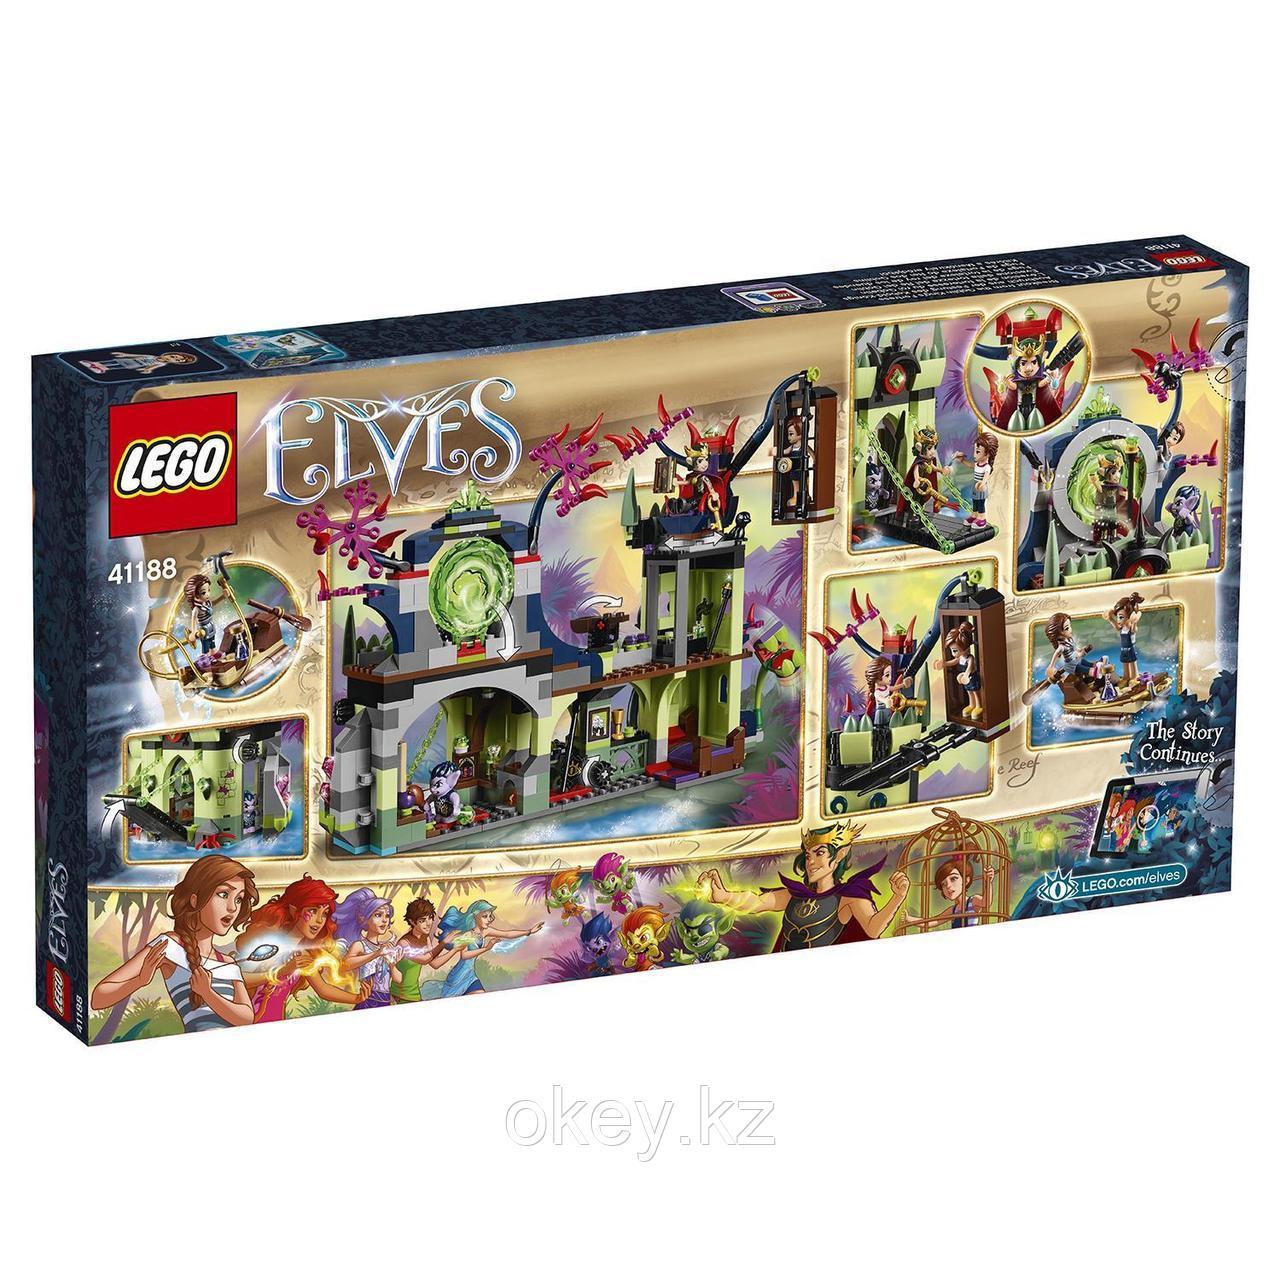 LEGO Elves: Побег из крепости Короля гоблинов 41188 - фото 2